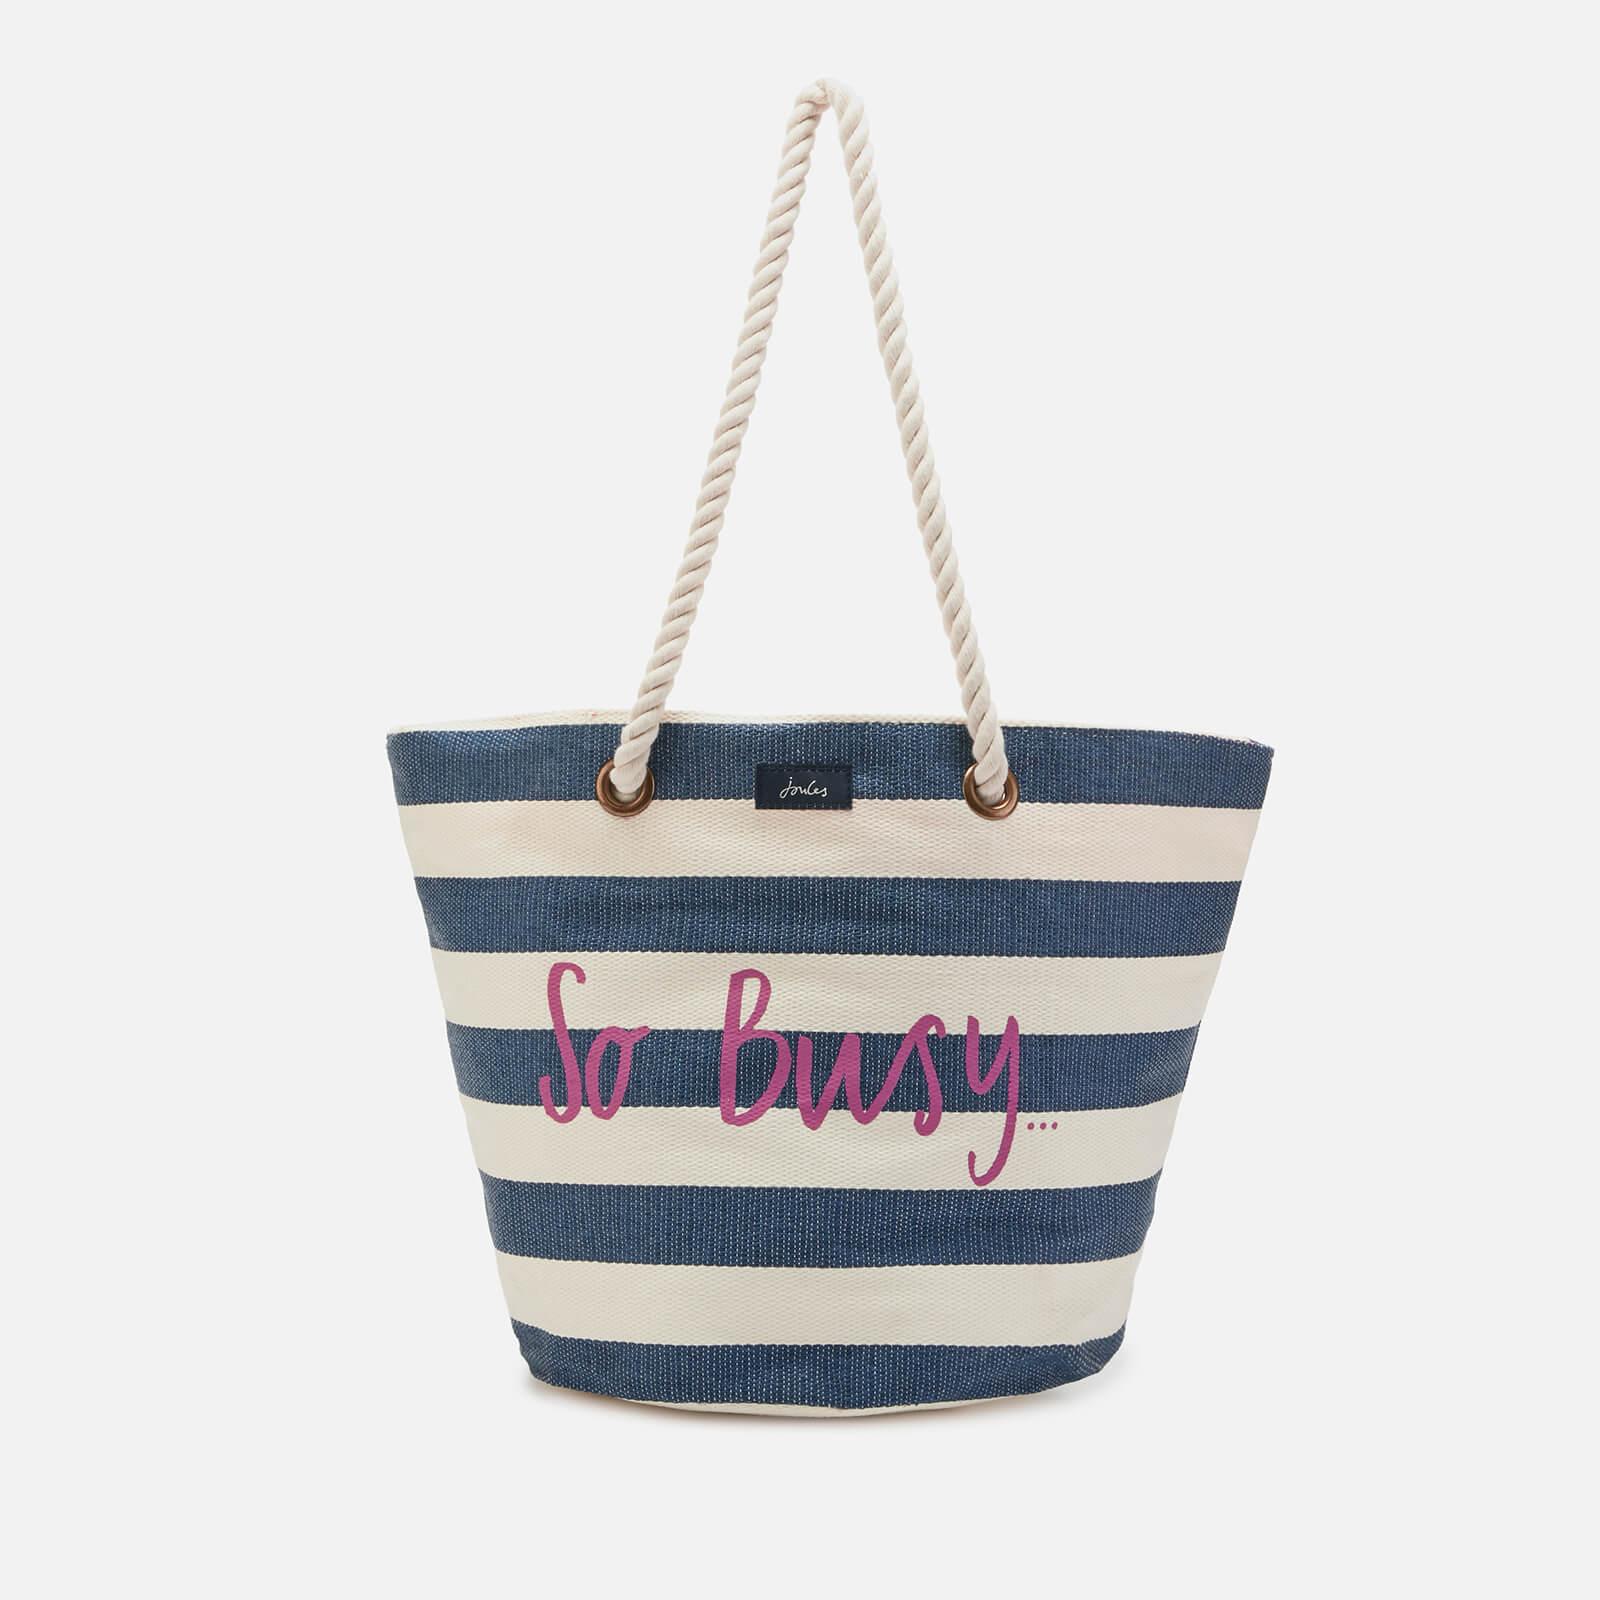 Joules Women's Seaside Summer Bag - Cream Stripe So Busy